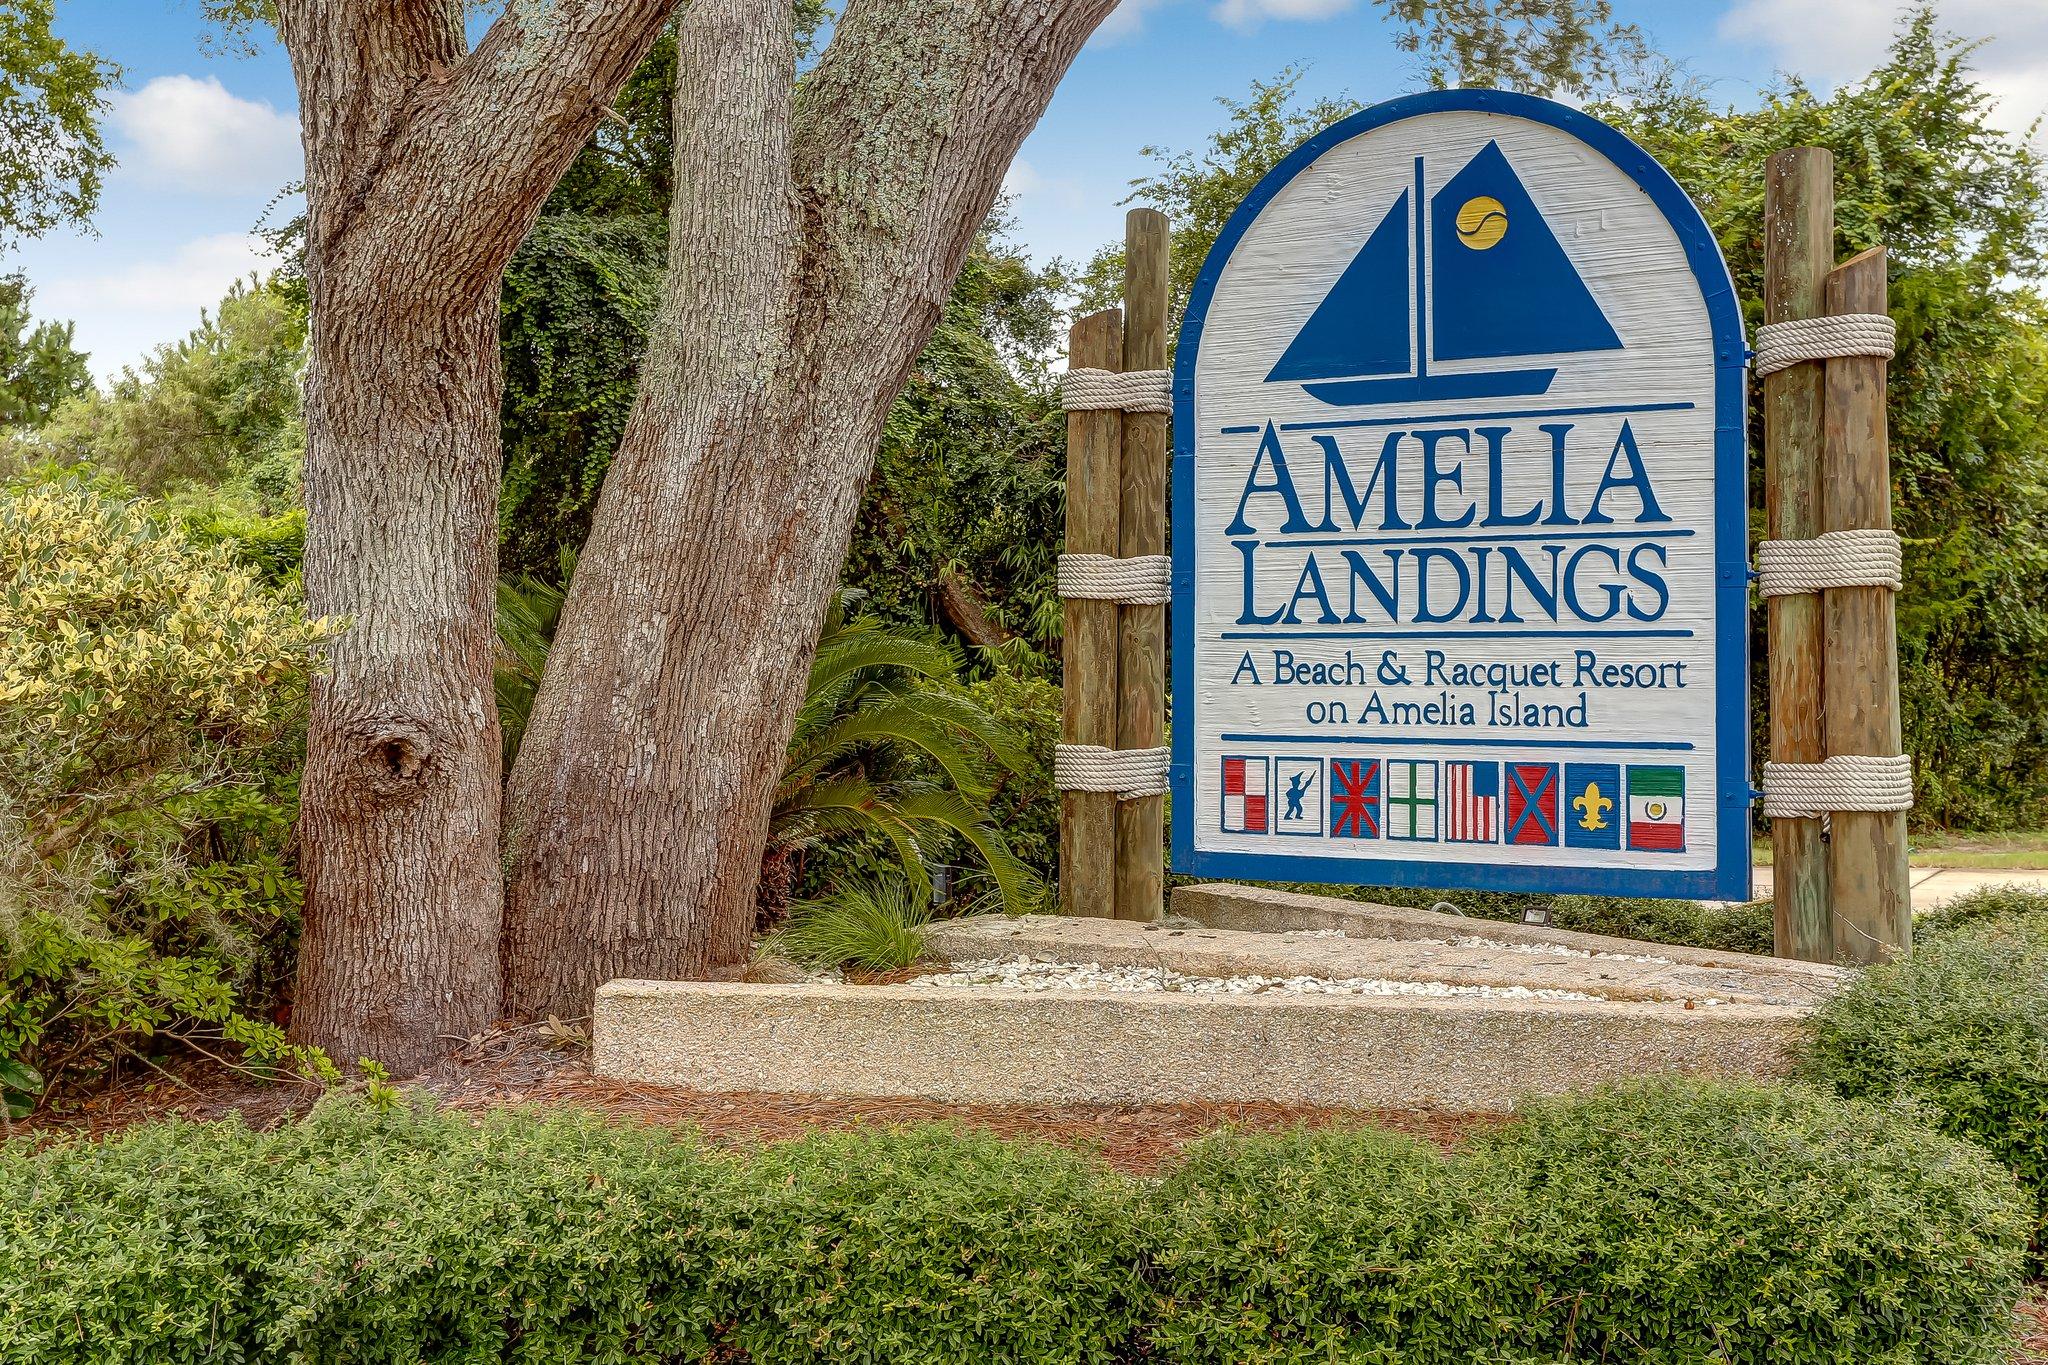 Amelia Landings